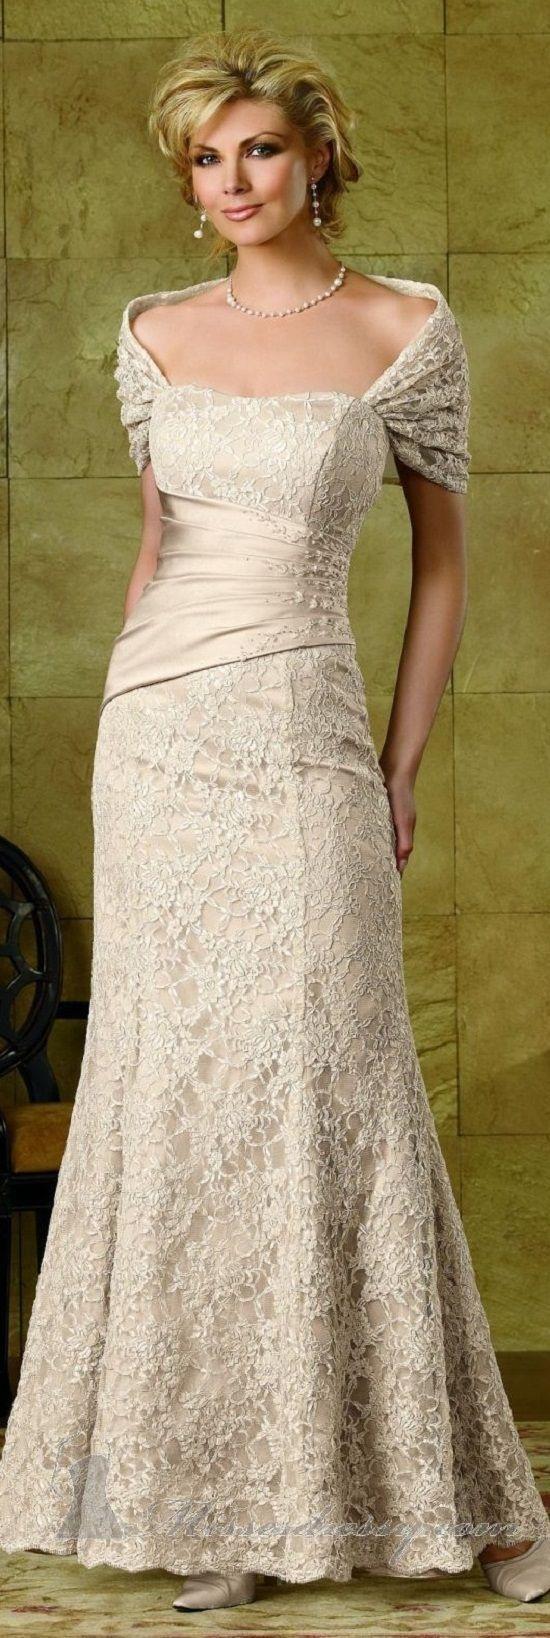 Wedding dresses for 50 year olds  Ivory Wedding Dresses for Older Brides  How to Dress for A Wedding